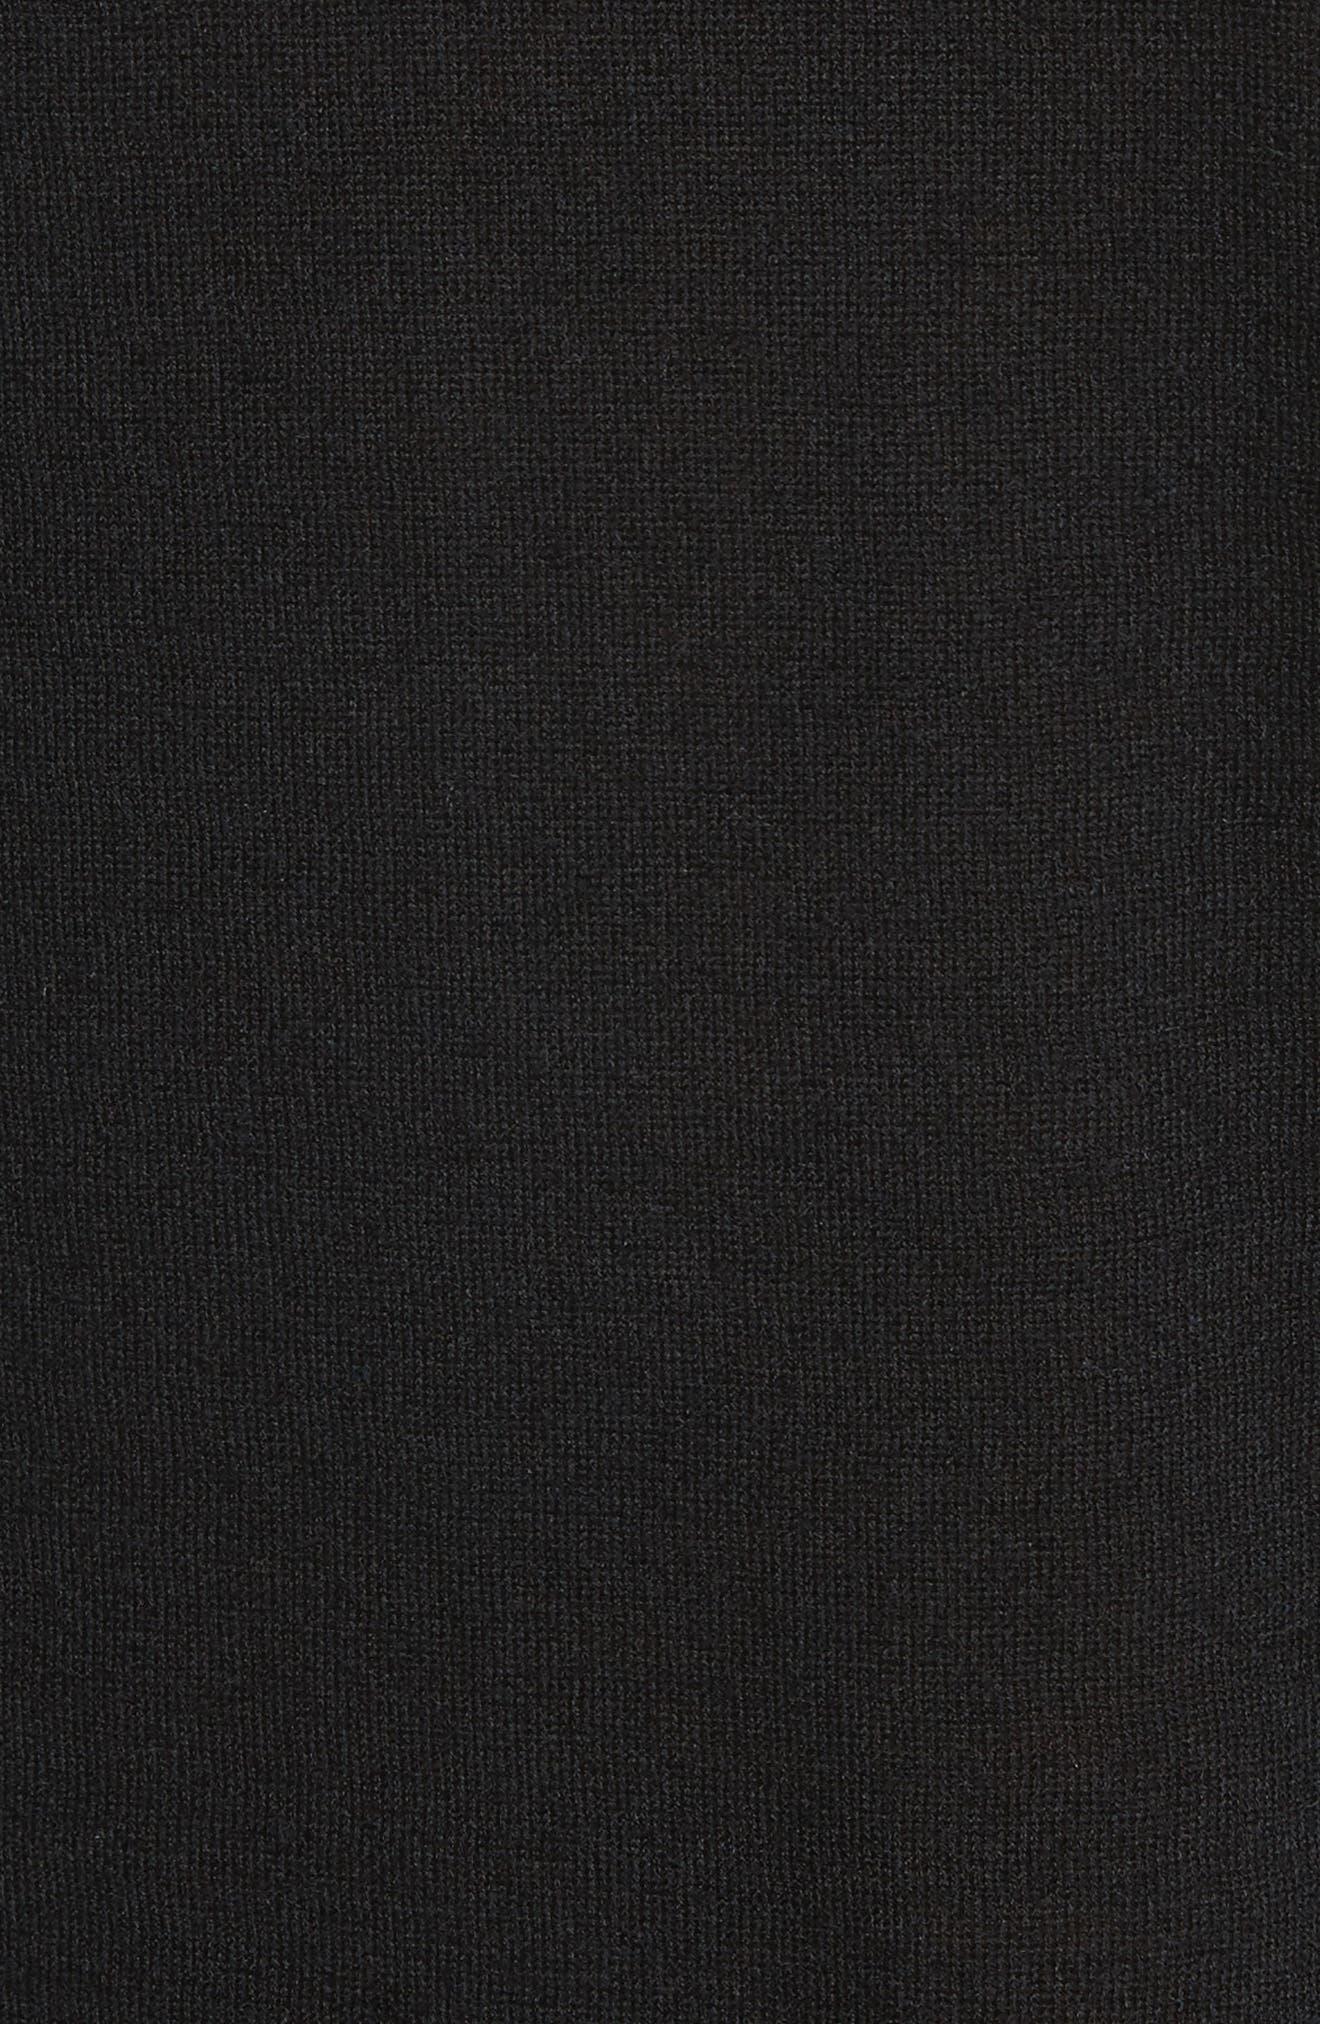 Crewneck Cashmere Sweater,                             Alternate thumbnail 5, color,                             001